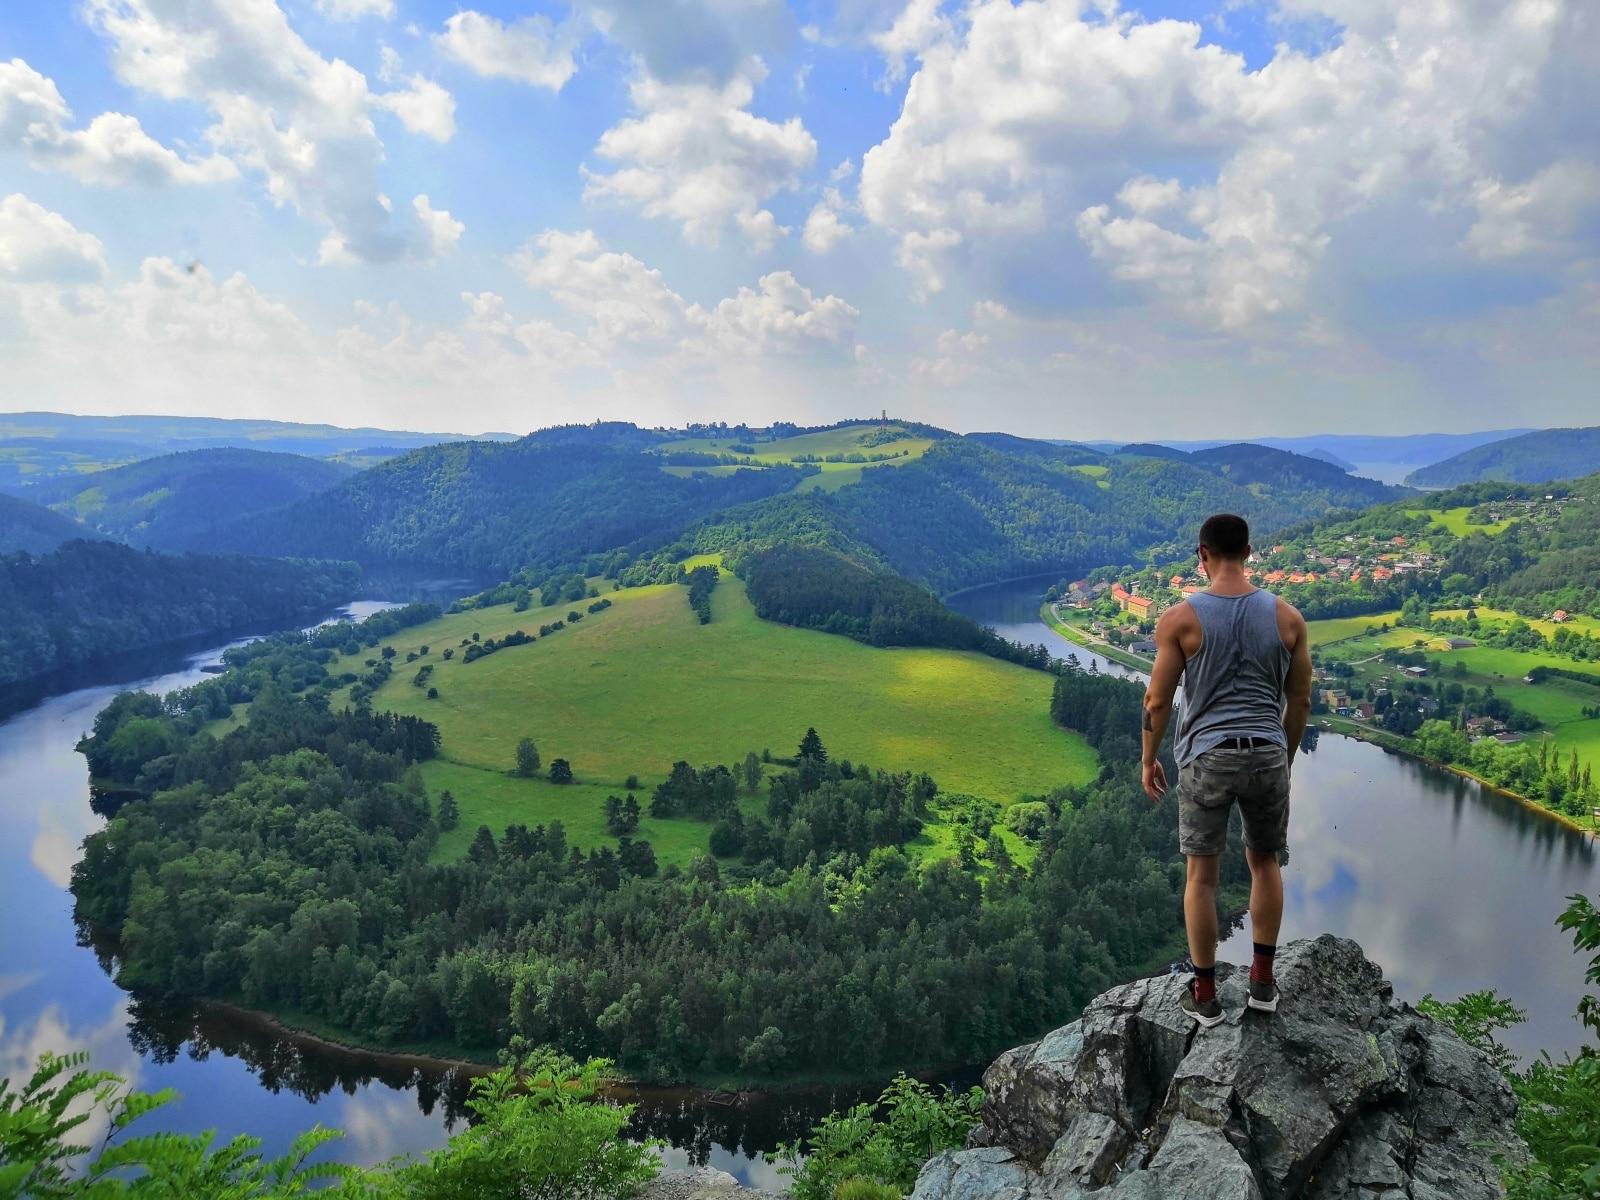 czech-country-side.jpg (466 KB)